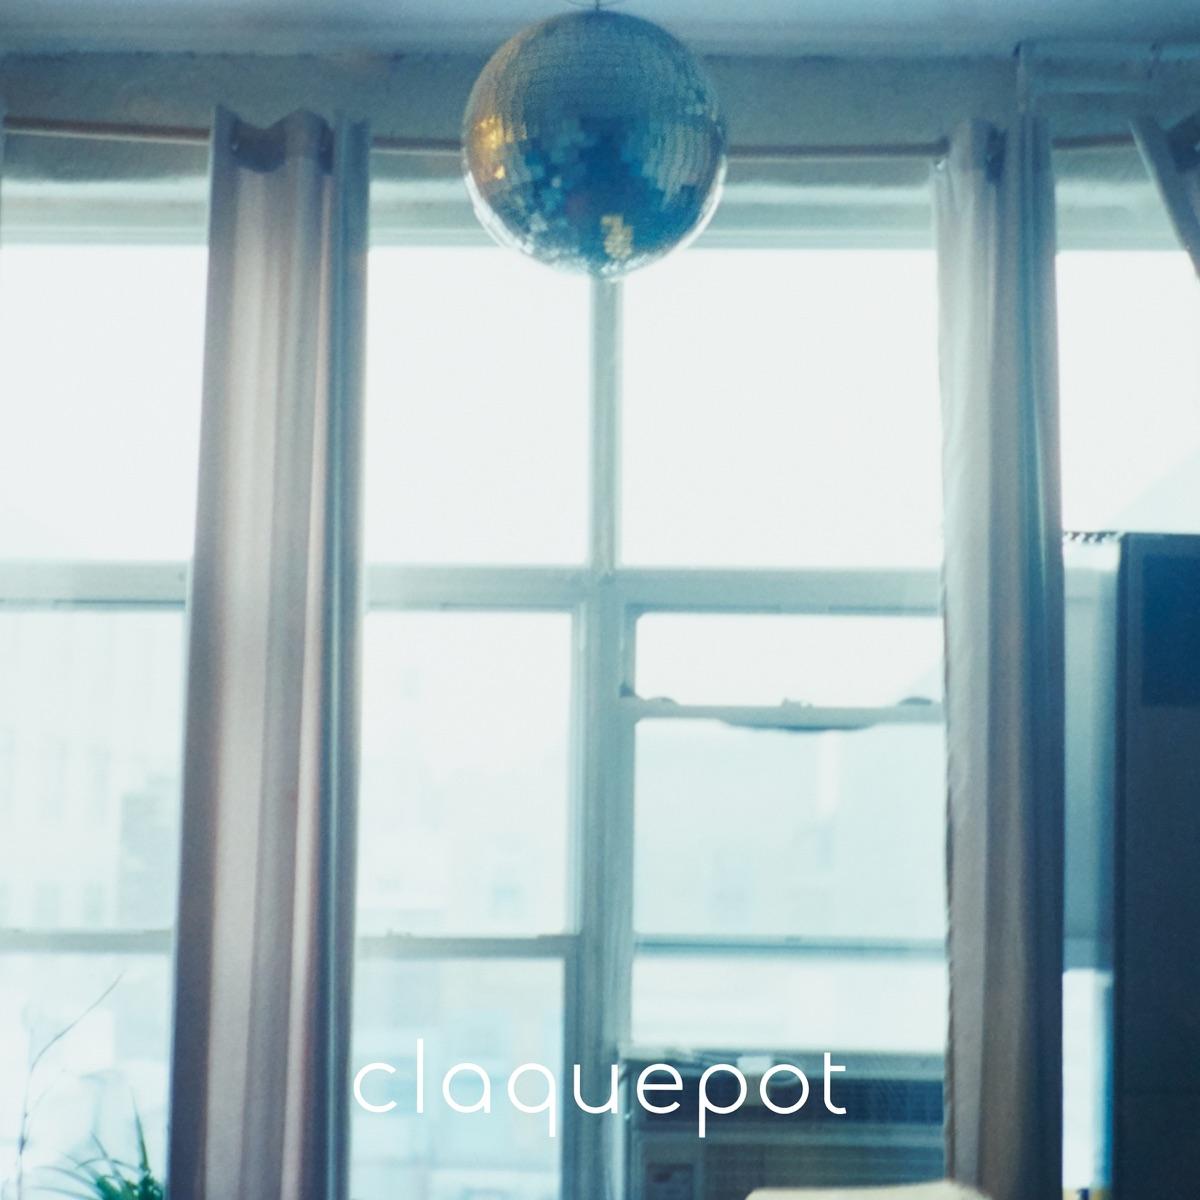 『claquepot choreo 歌詞』収録の『choreo』ジャケット